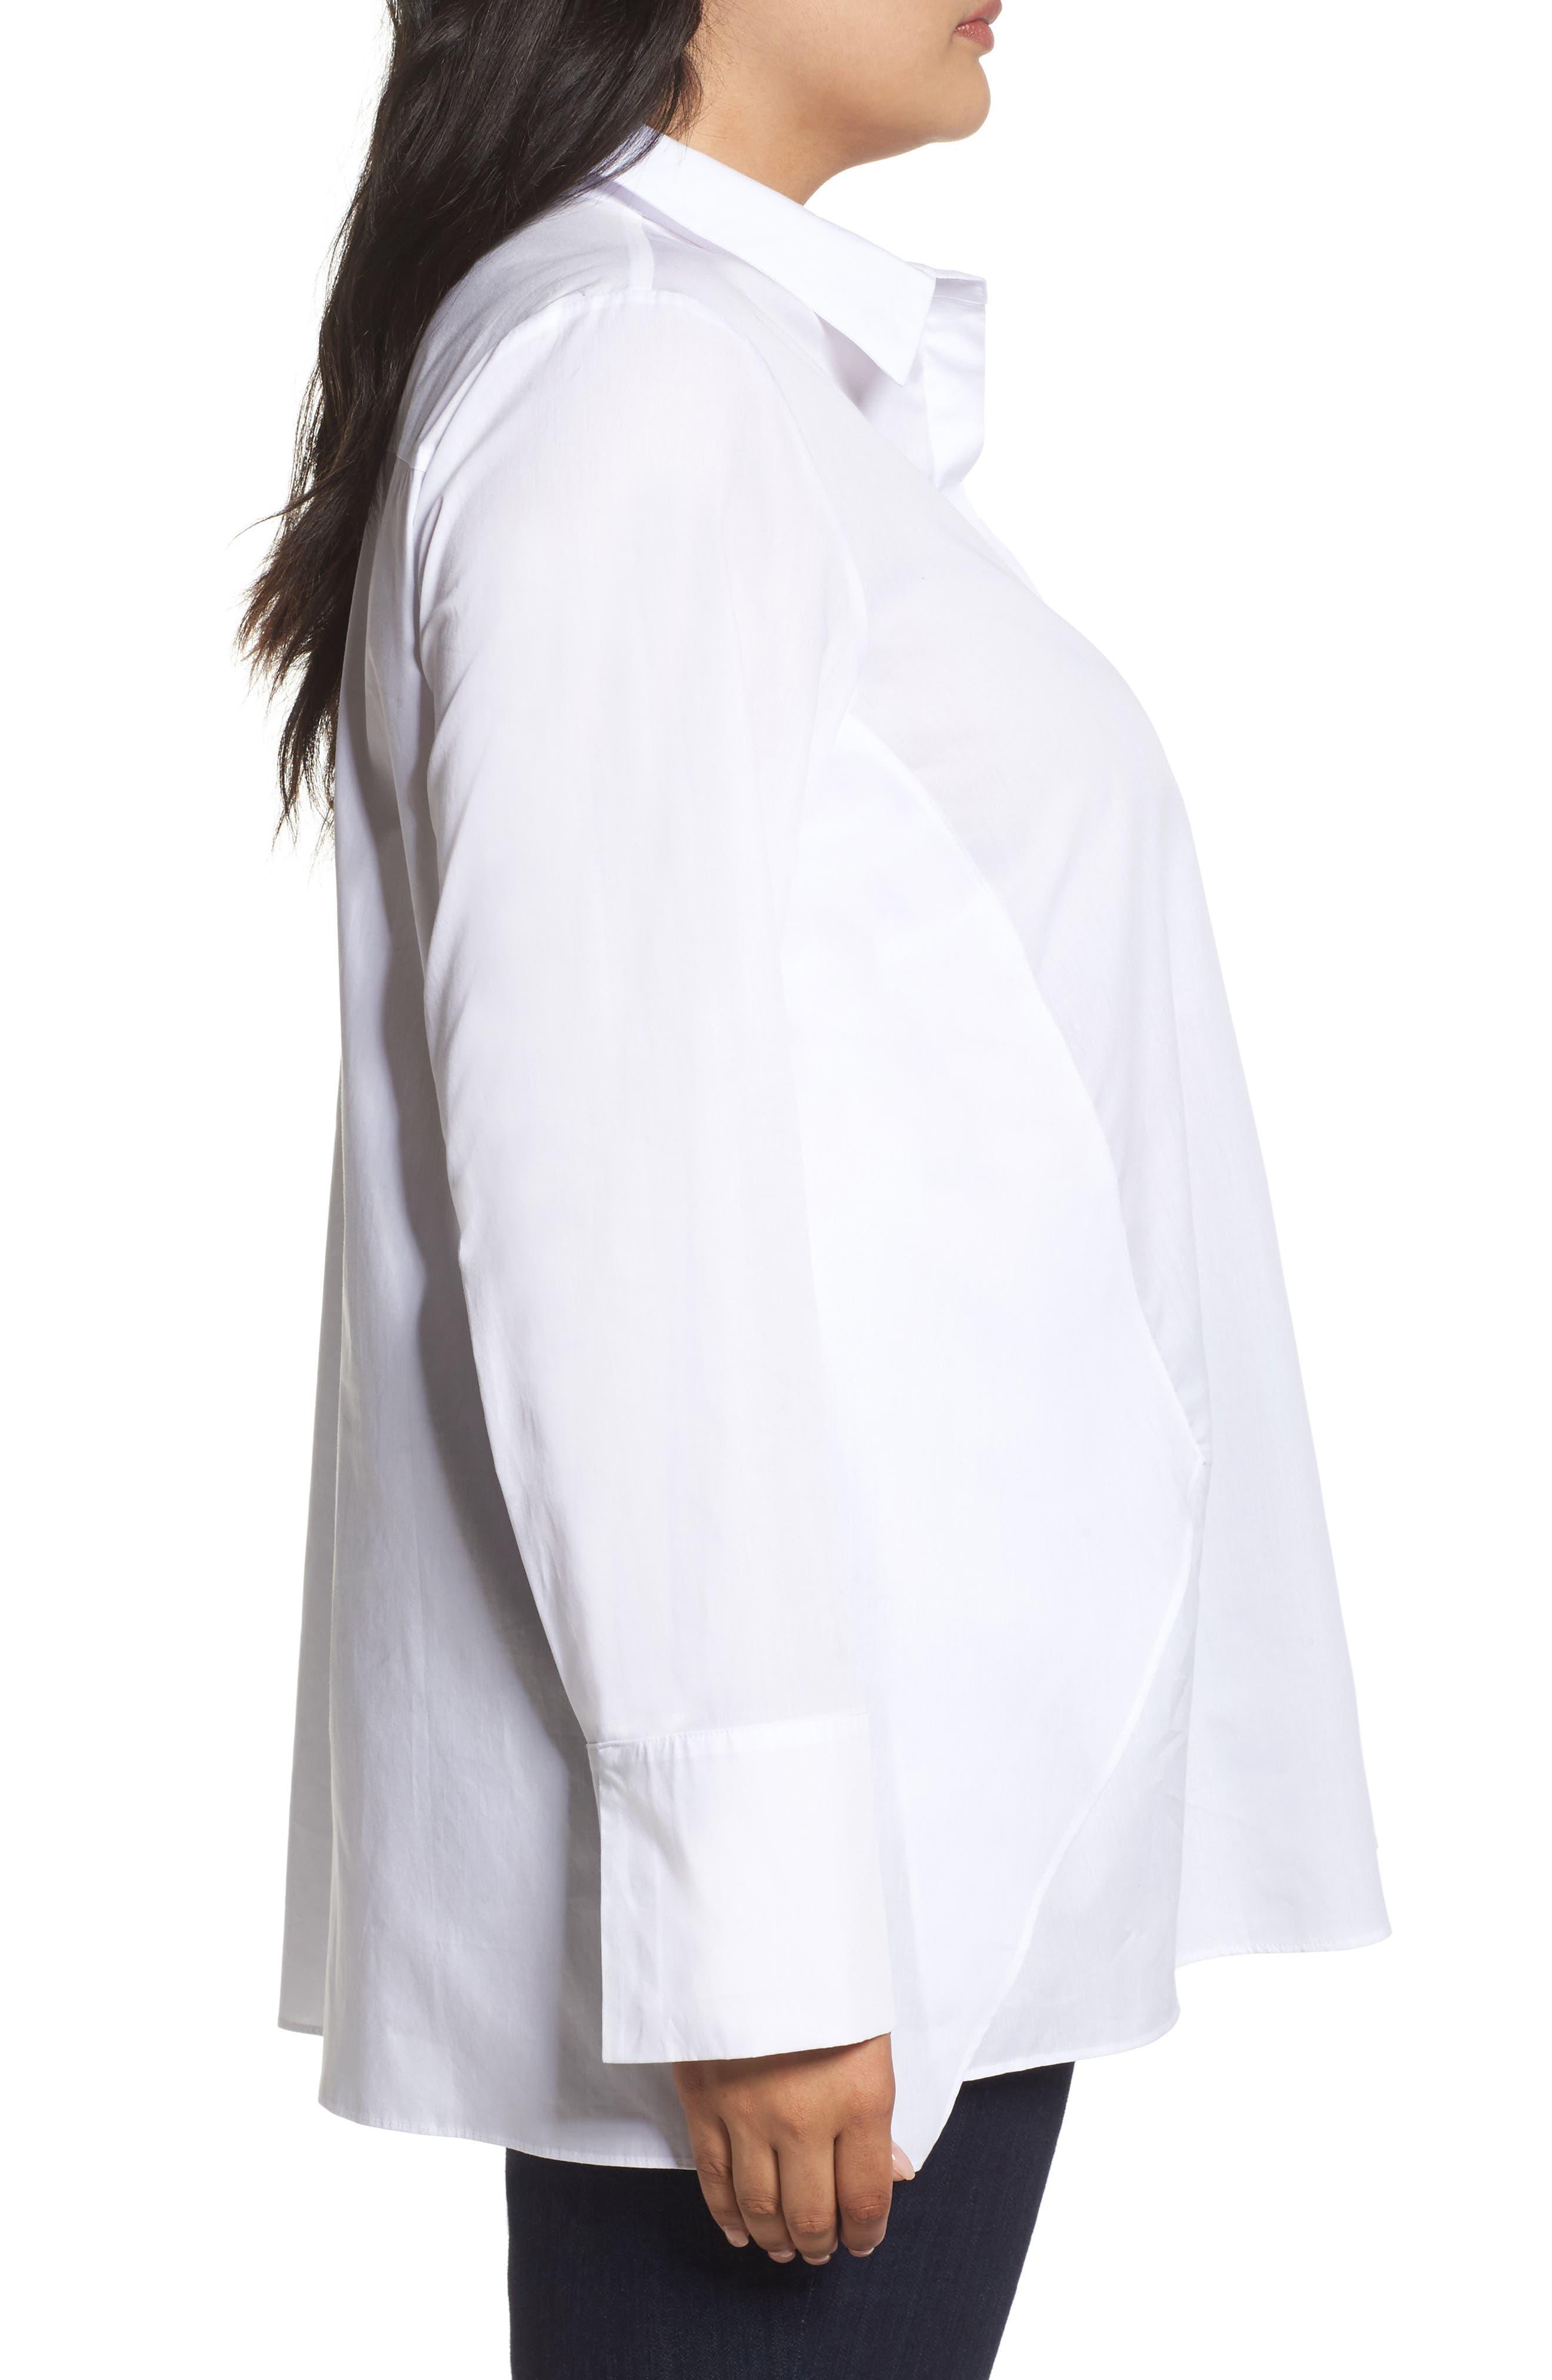 Fato Shirt,                             Alternate thumbnail 3, color,                             White